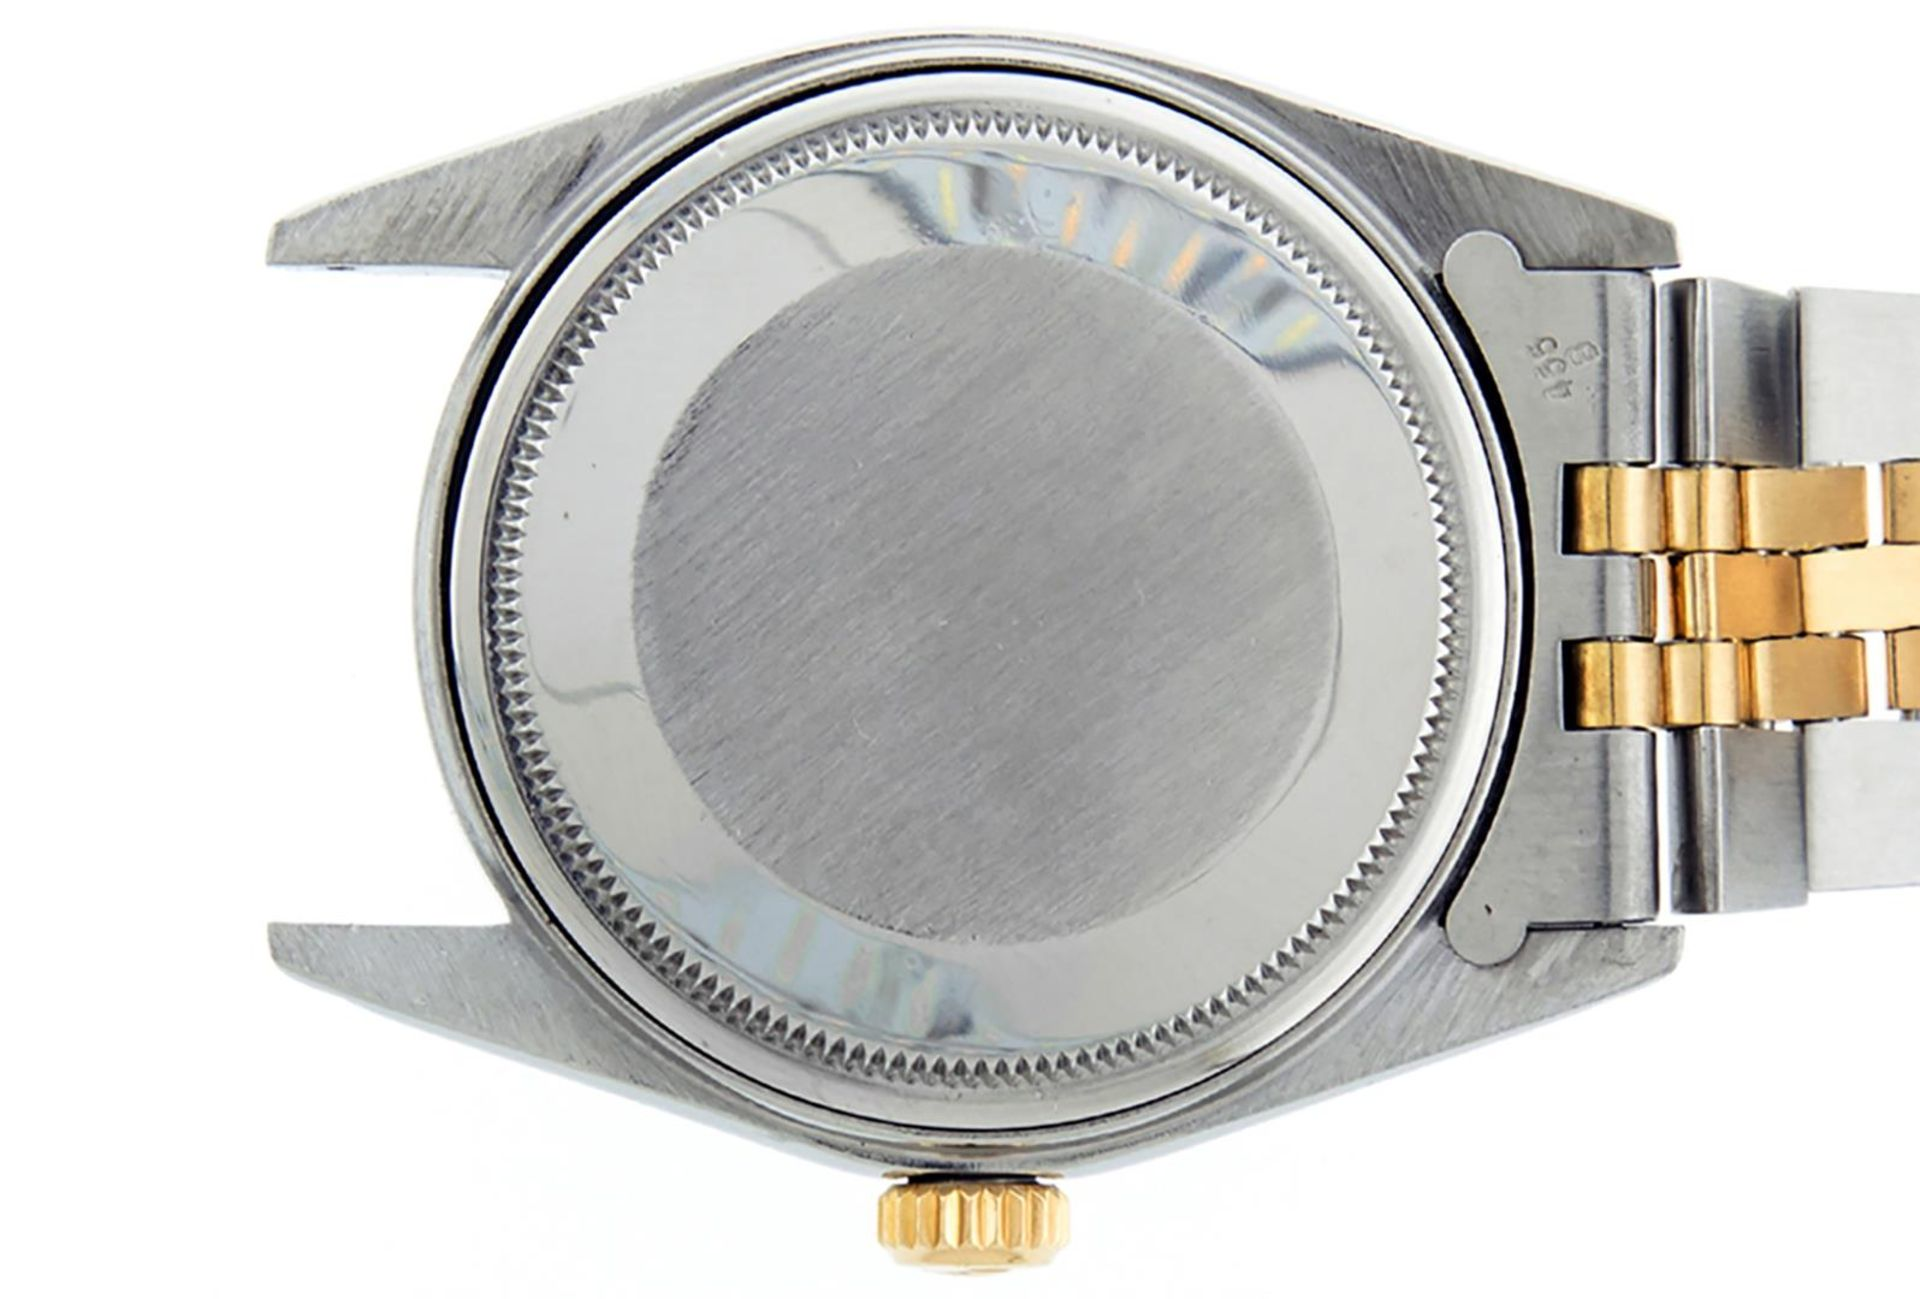 Rolex Mens 2 Tone Black Diamond 36MM Datejust Wristwatch - Image 8 of 9